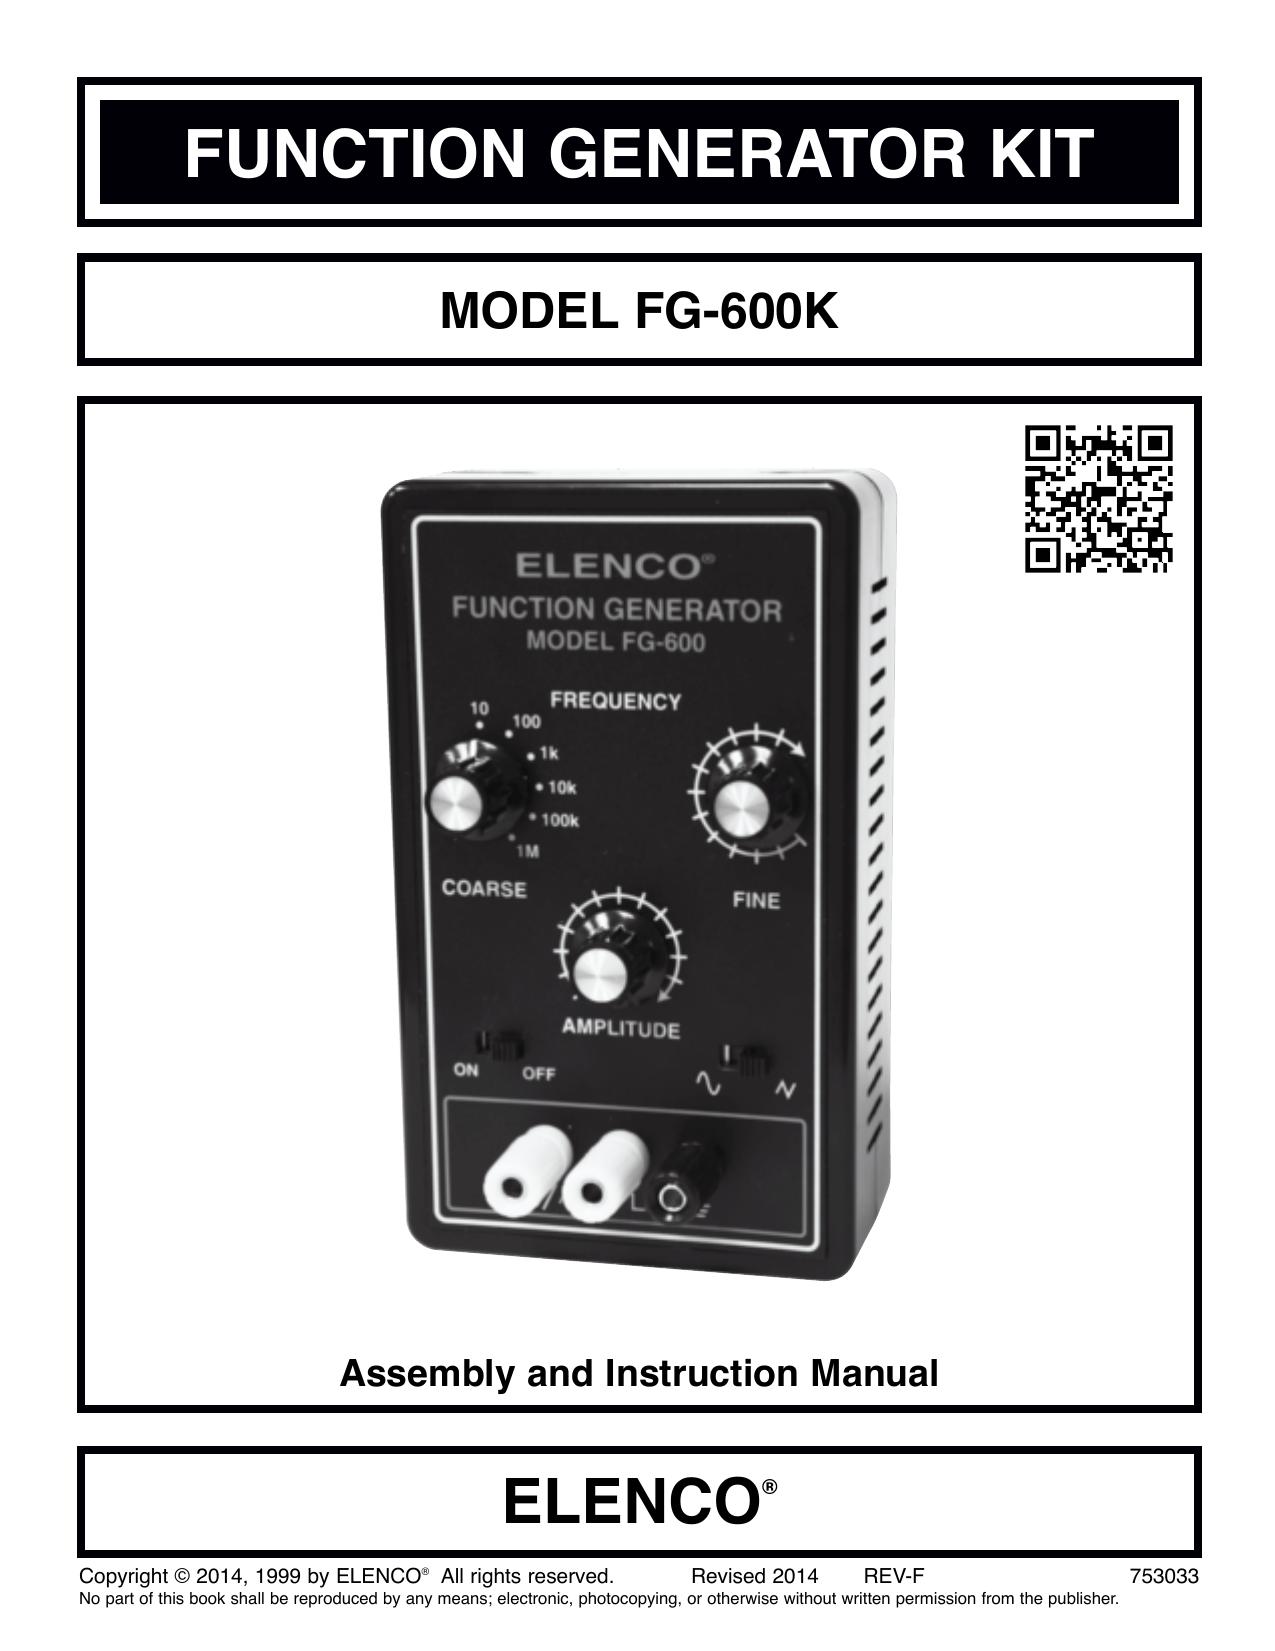 Function Generator Kit Two Ic Am Radio With Training Course Model Am780k Electronic 018904457 1 B587db10fe16818627821c55dedaf1e4